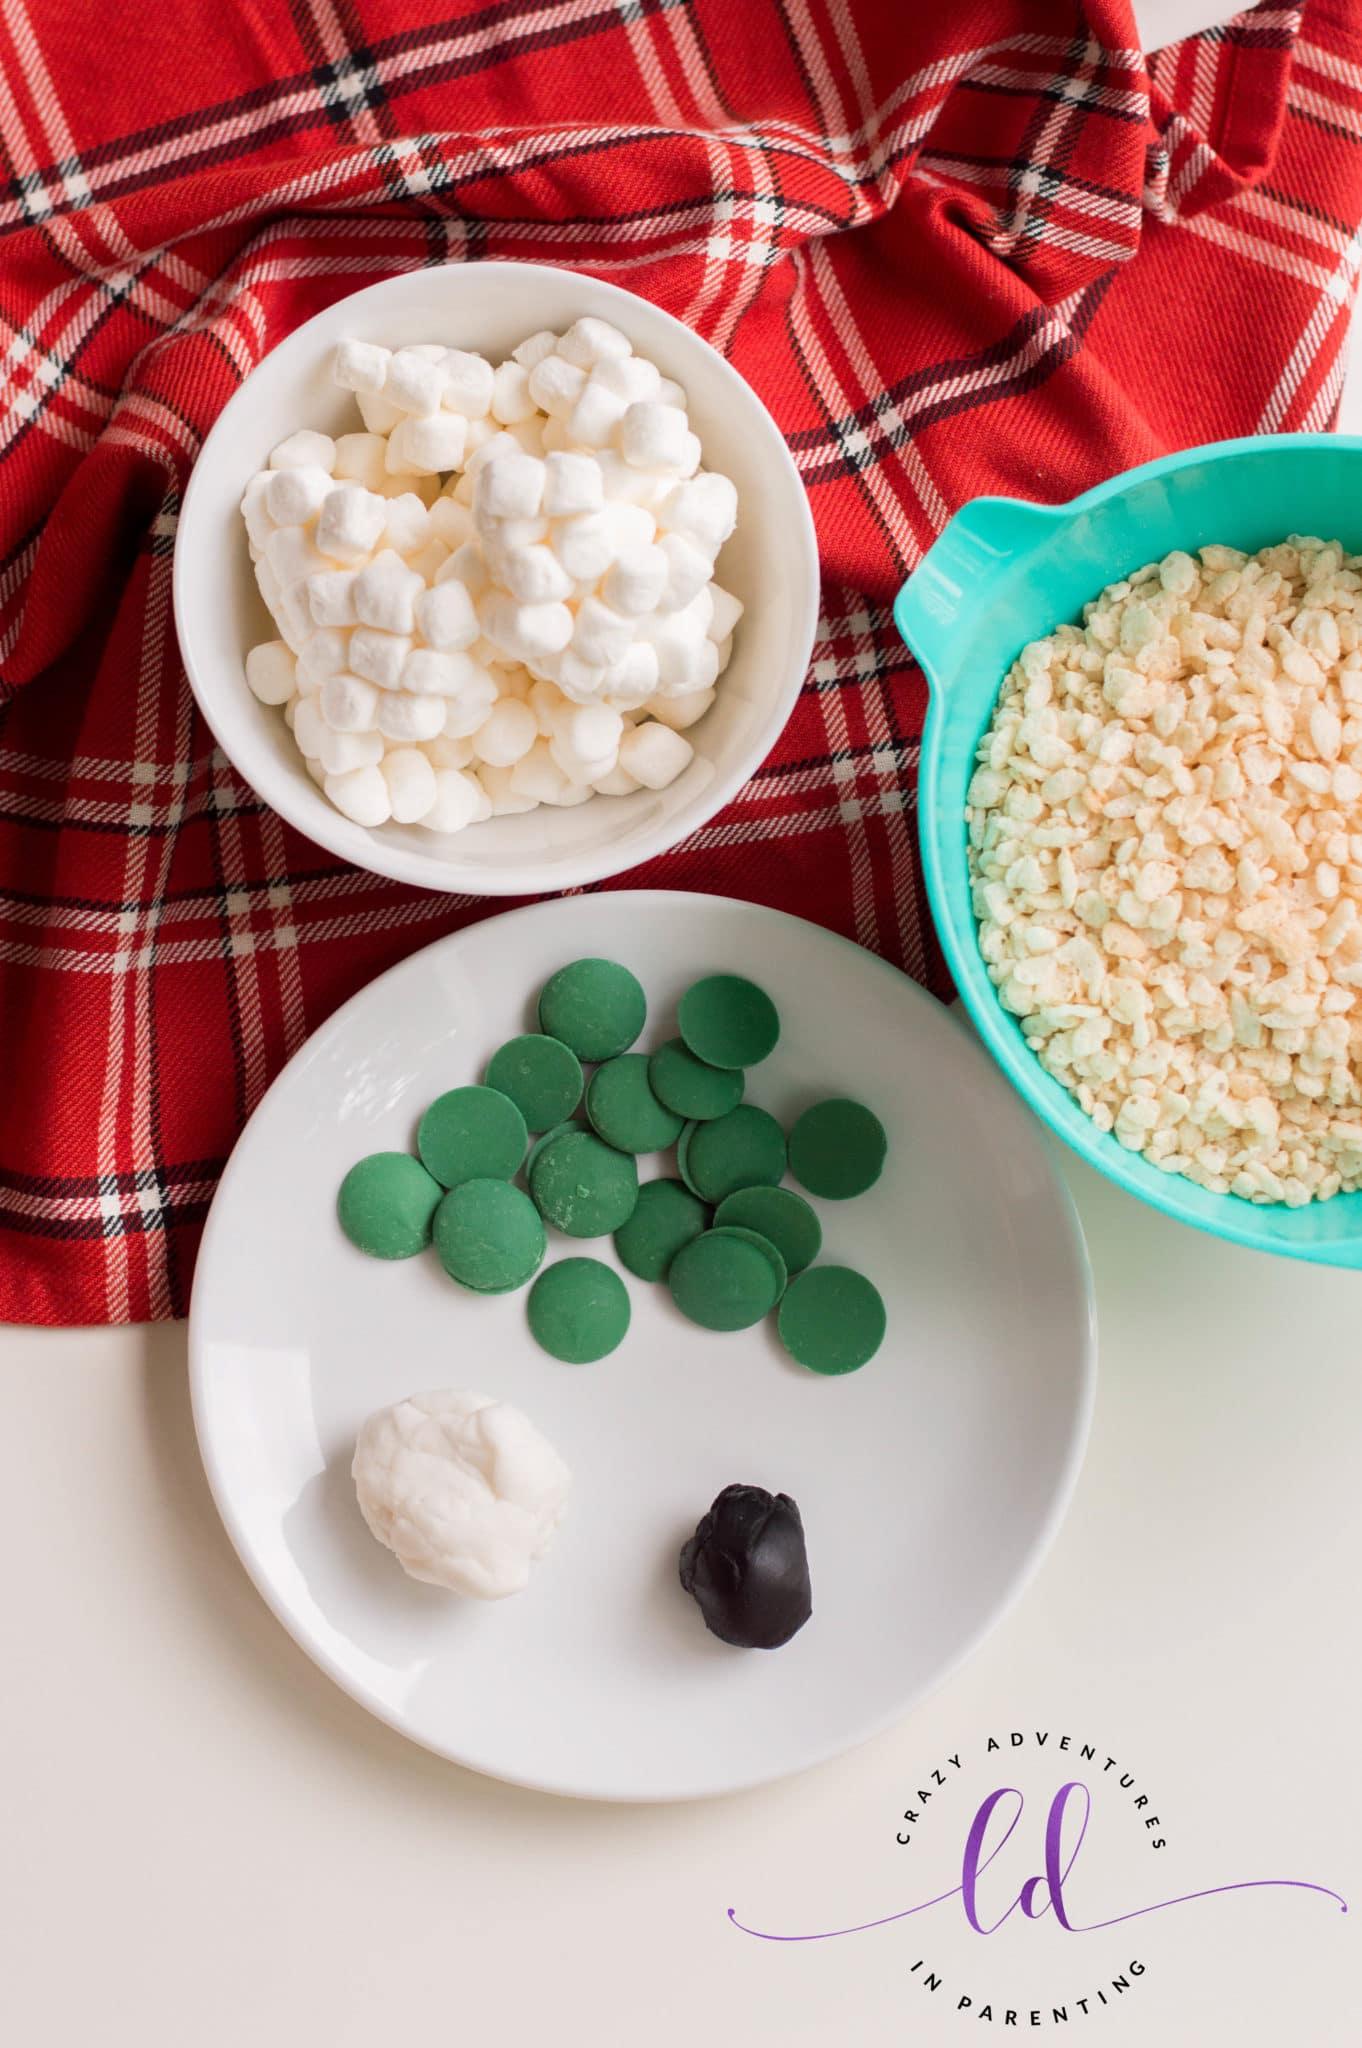 Ingredients Needed to Make Halloween Eyeballs Rice Krispies Treats